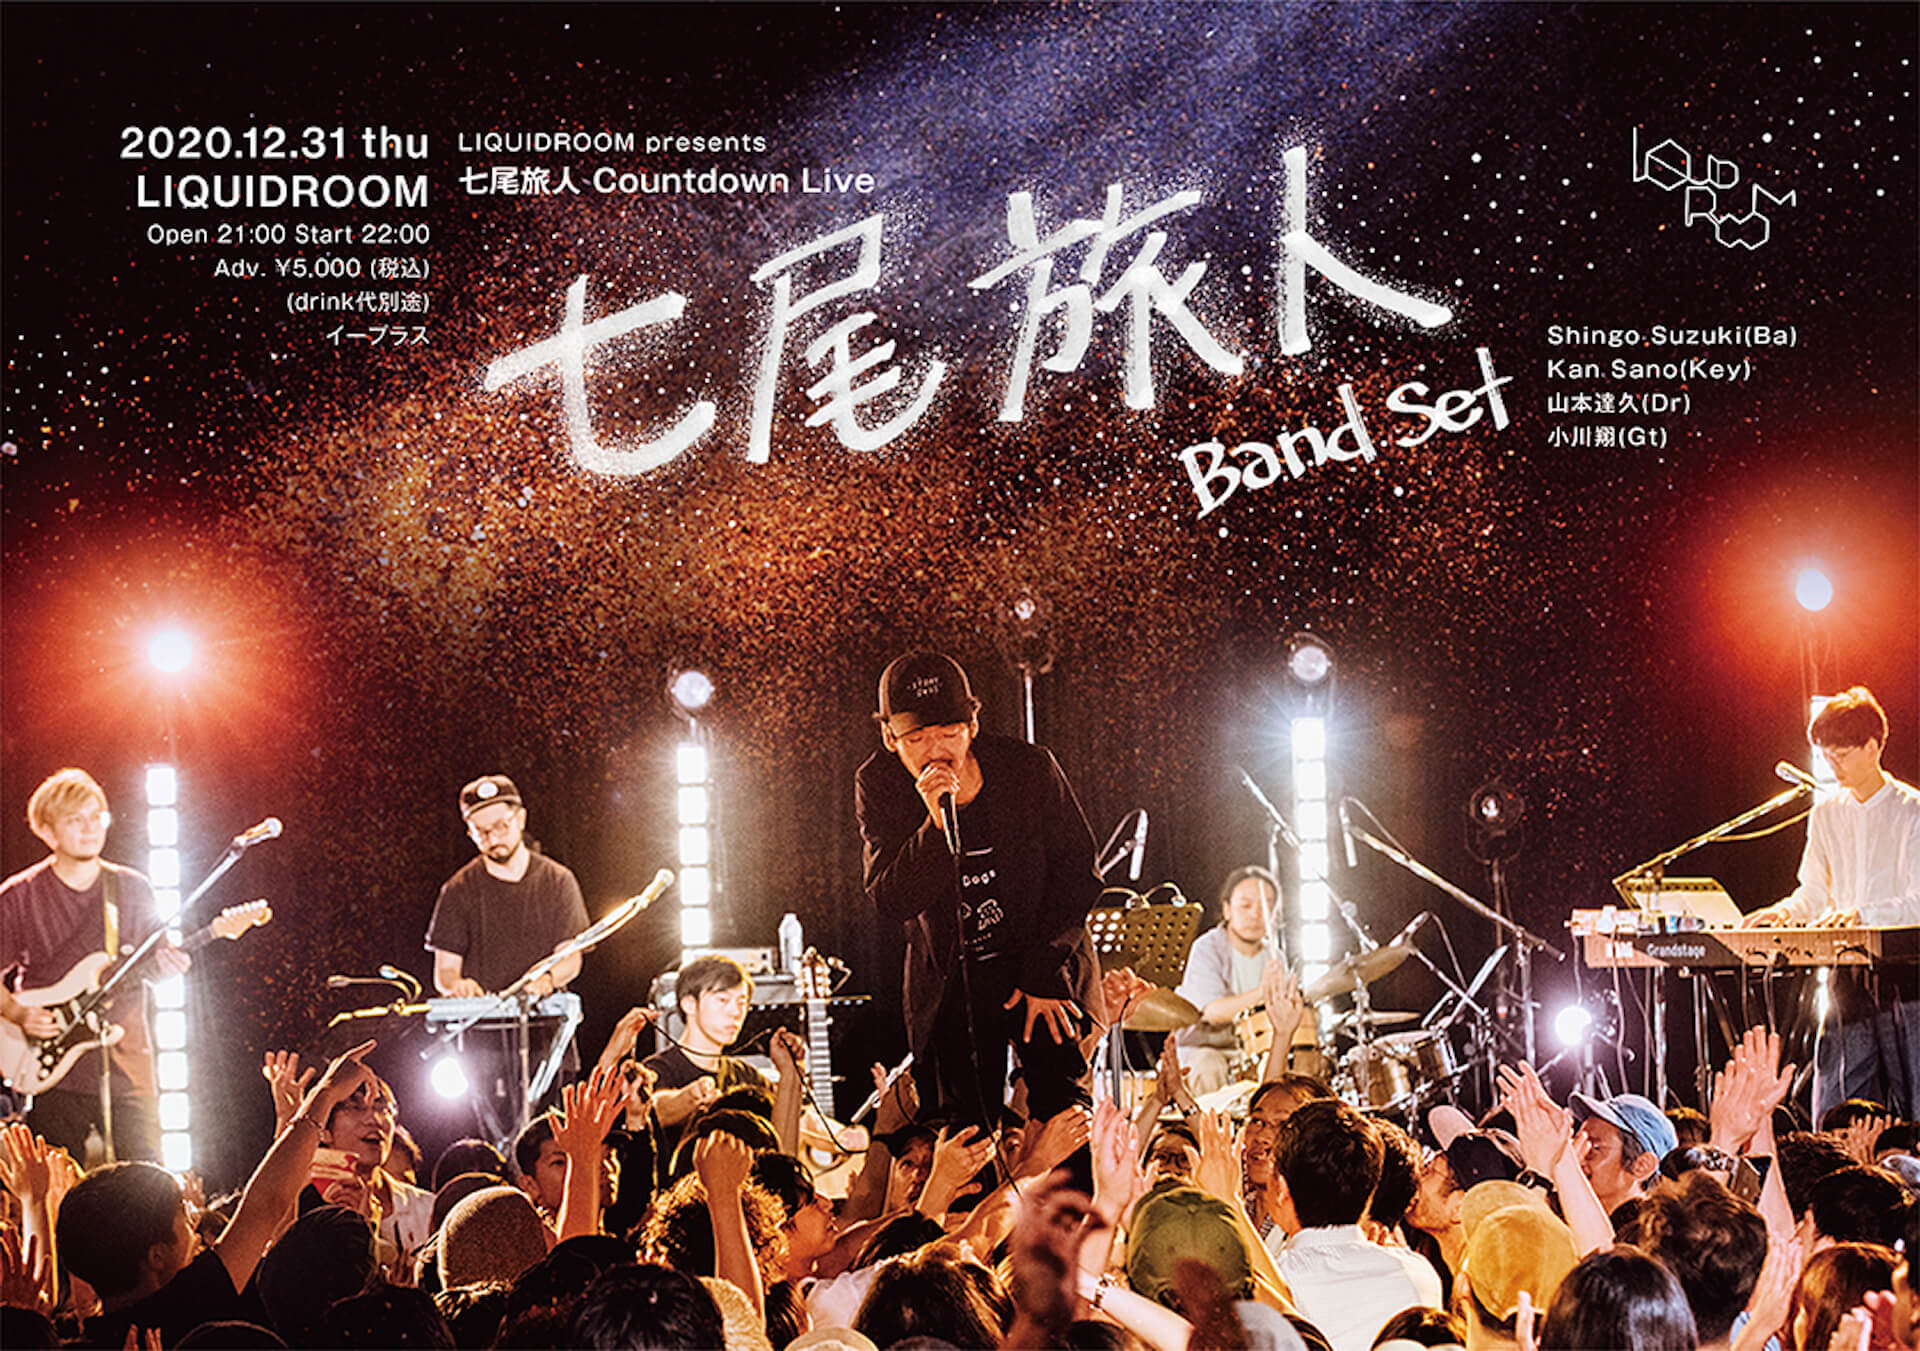 Keep The Beat Ticking「音楽の針を止めない」| Seiko × LIQUIDROOMのコラボレーションが決定 music201211-KeepTheBeatTicking-4